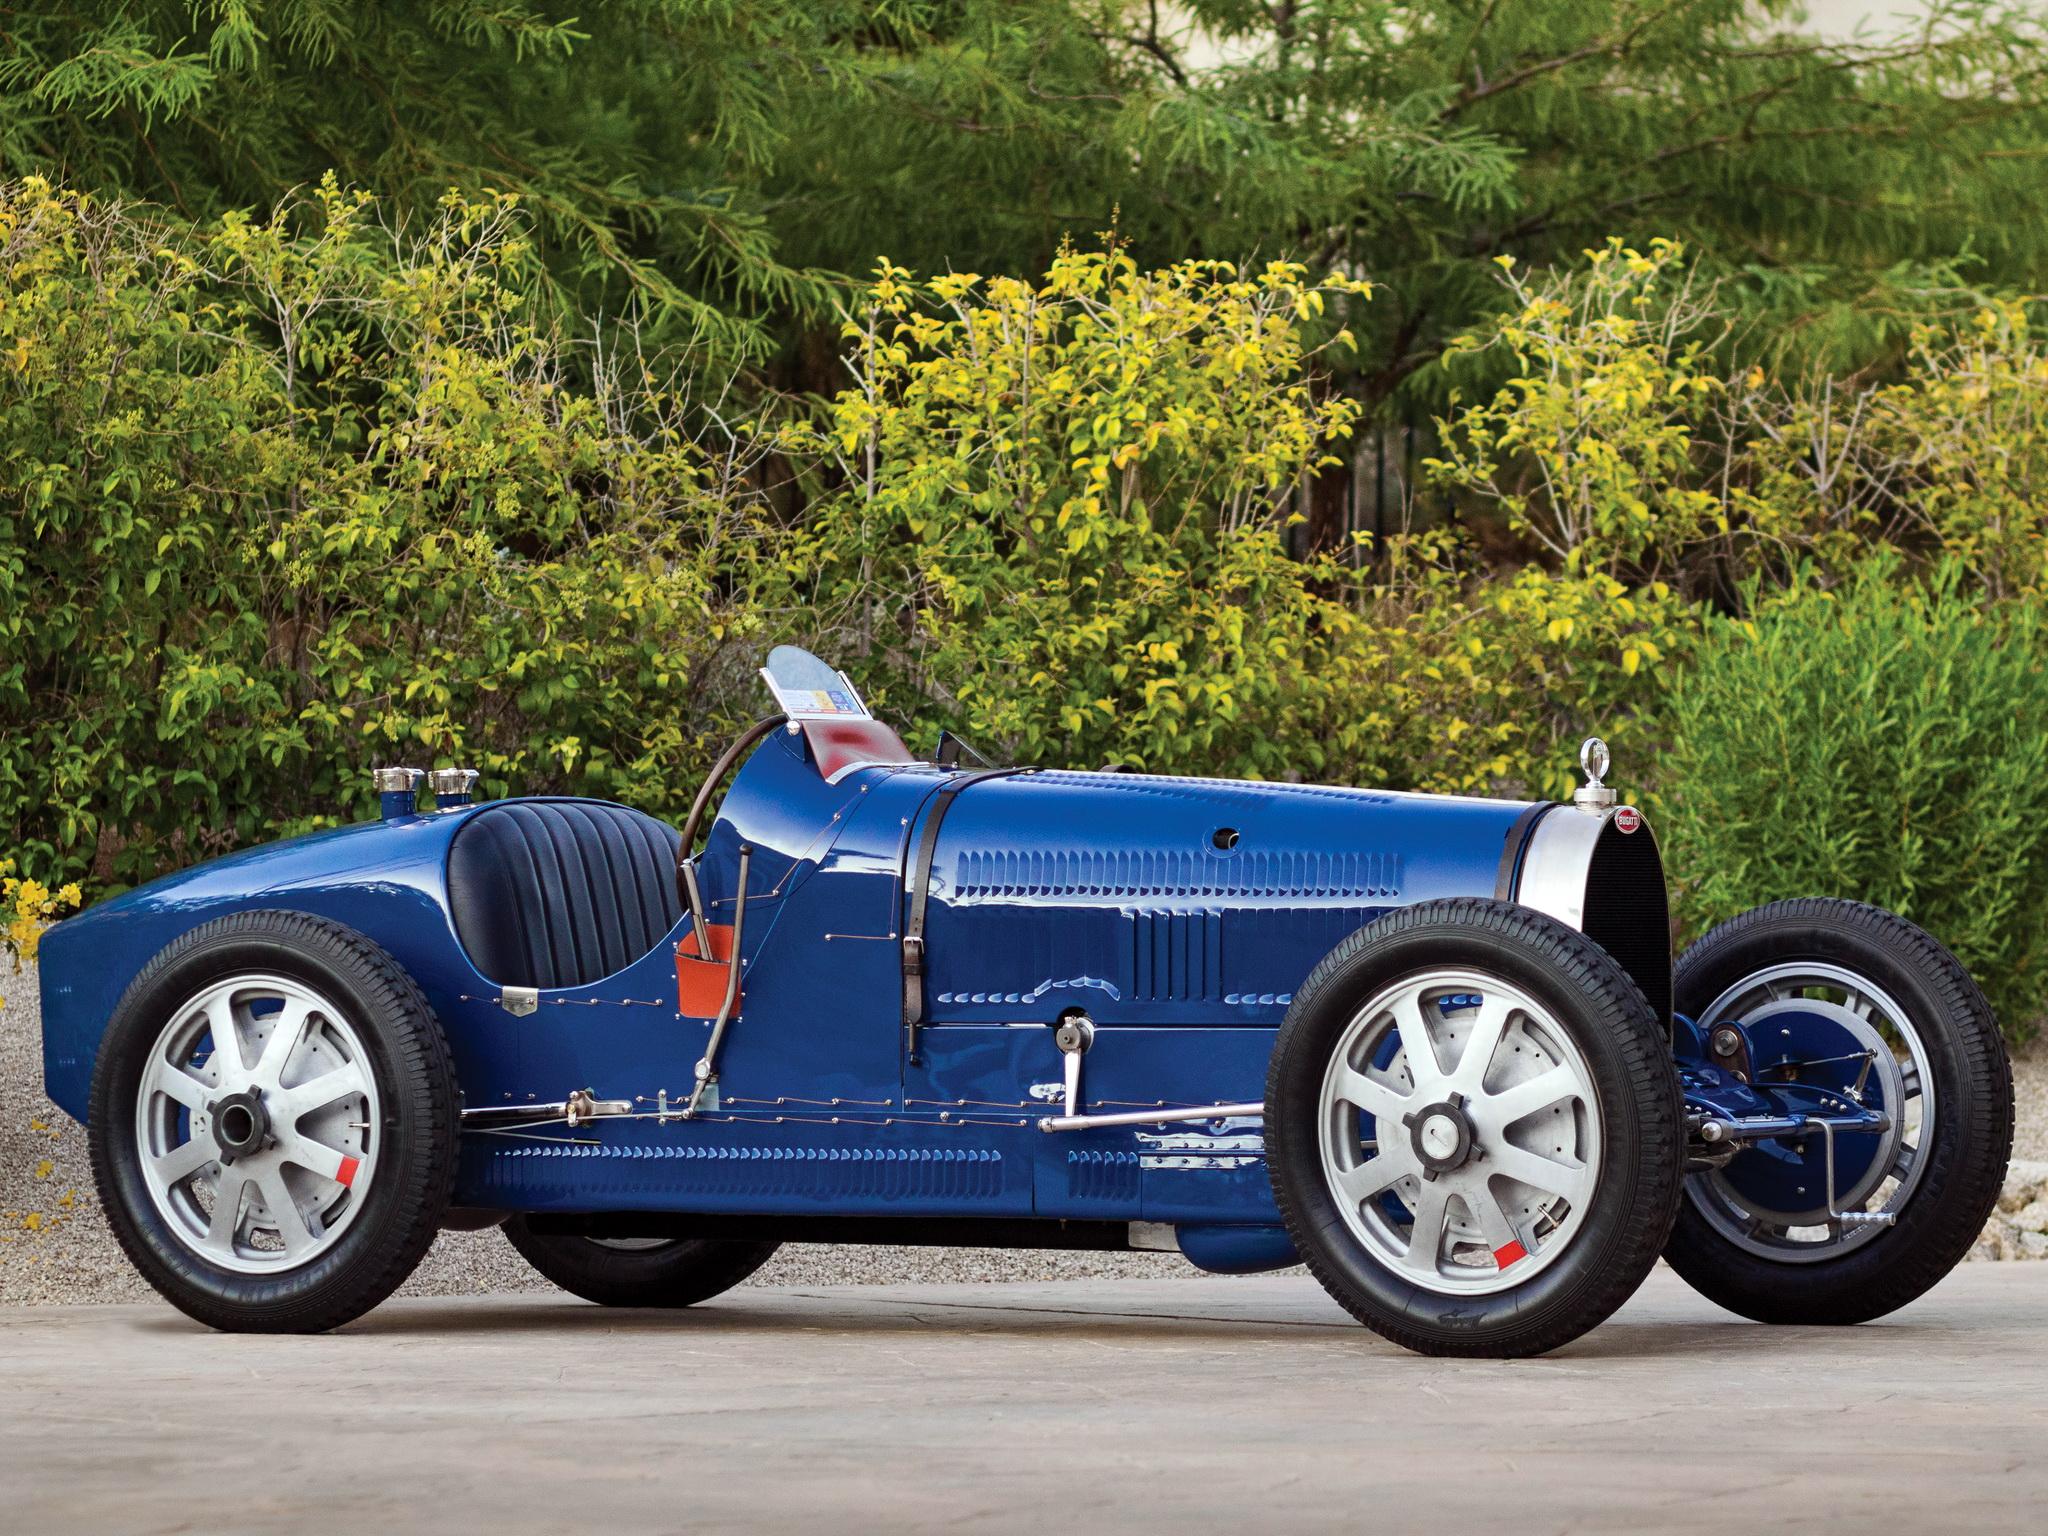 1930 bugatti type 35 retro race racing f wallpaper 2048x1536 170646 wallpaperup. Black Bedroom Furniture Sets. Home Design Ideas